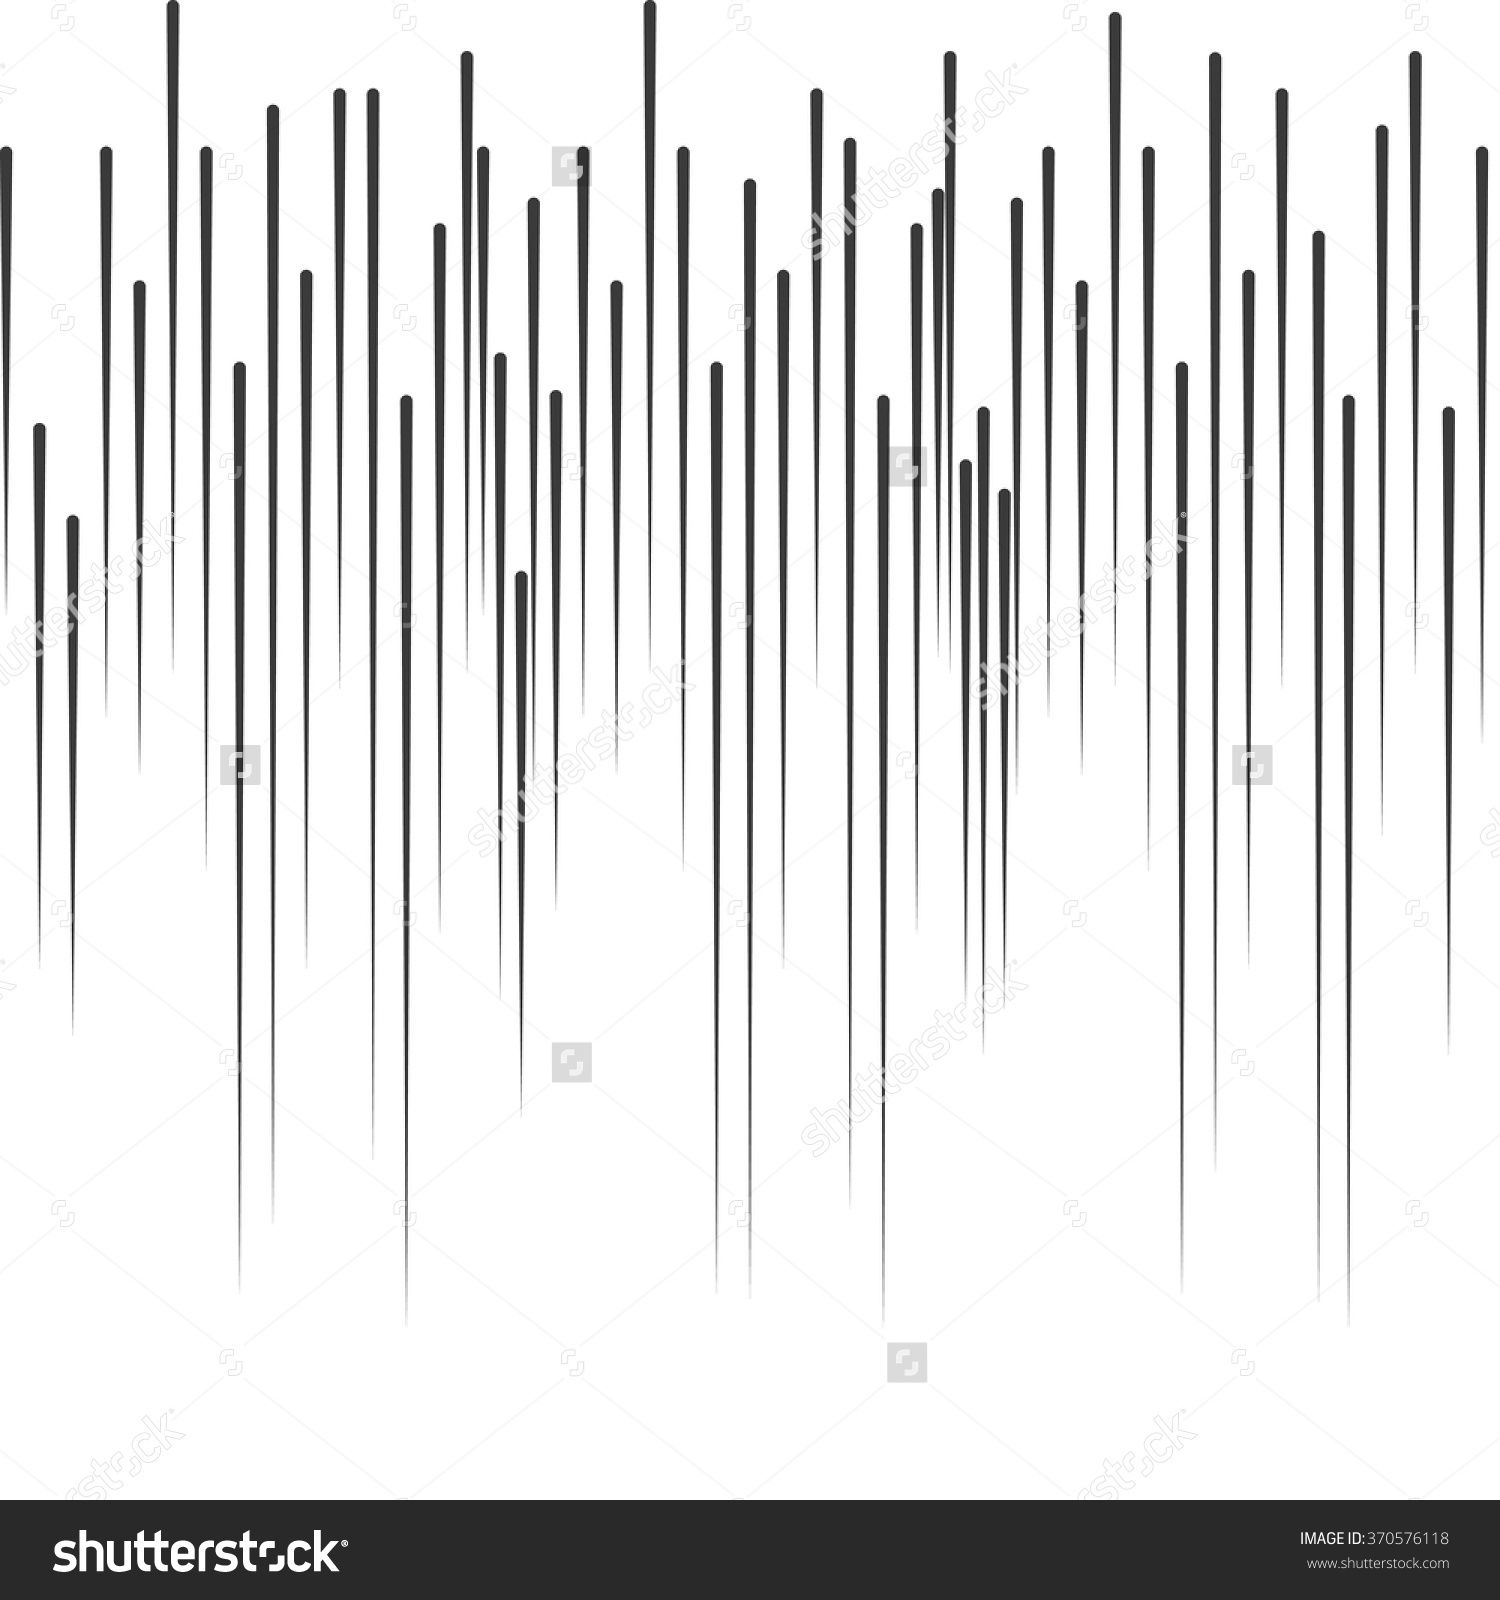 Comic Book Vector Manga Rain Motion Lines Effects Vertical Stripe Speed Rays Manga Comic Books Vector Images